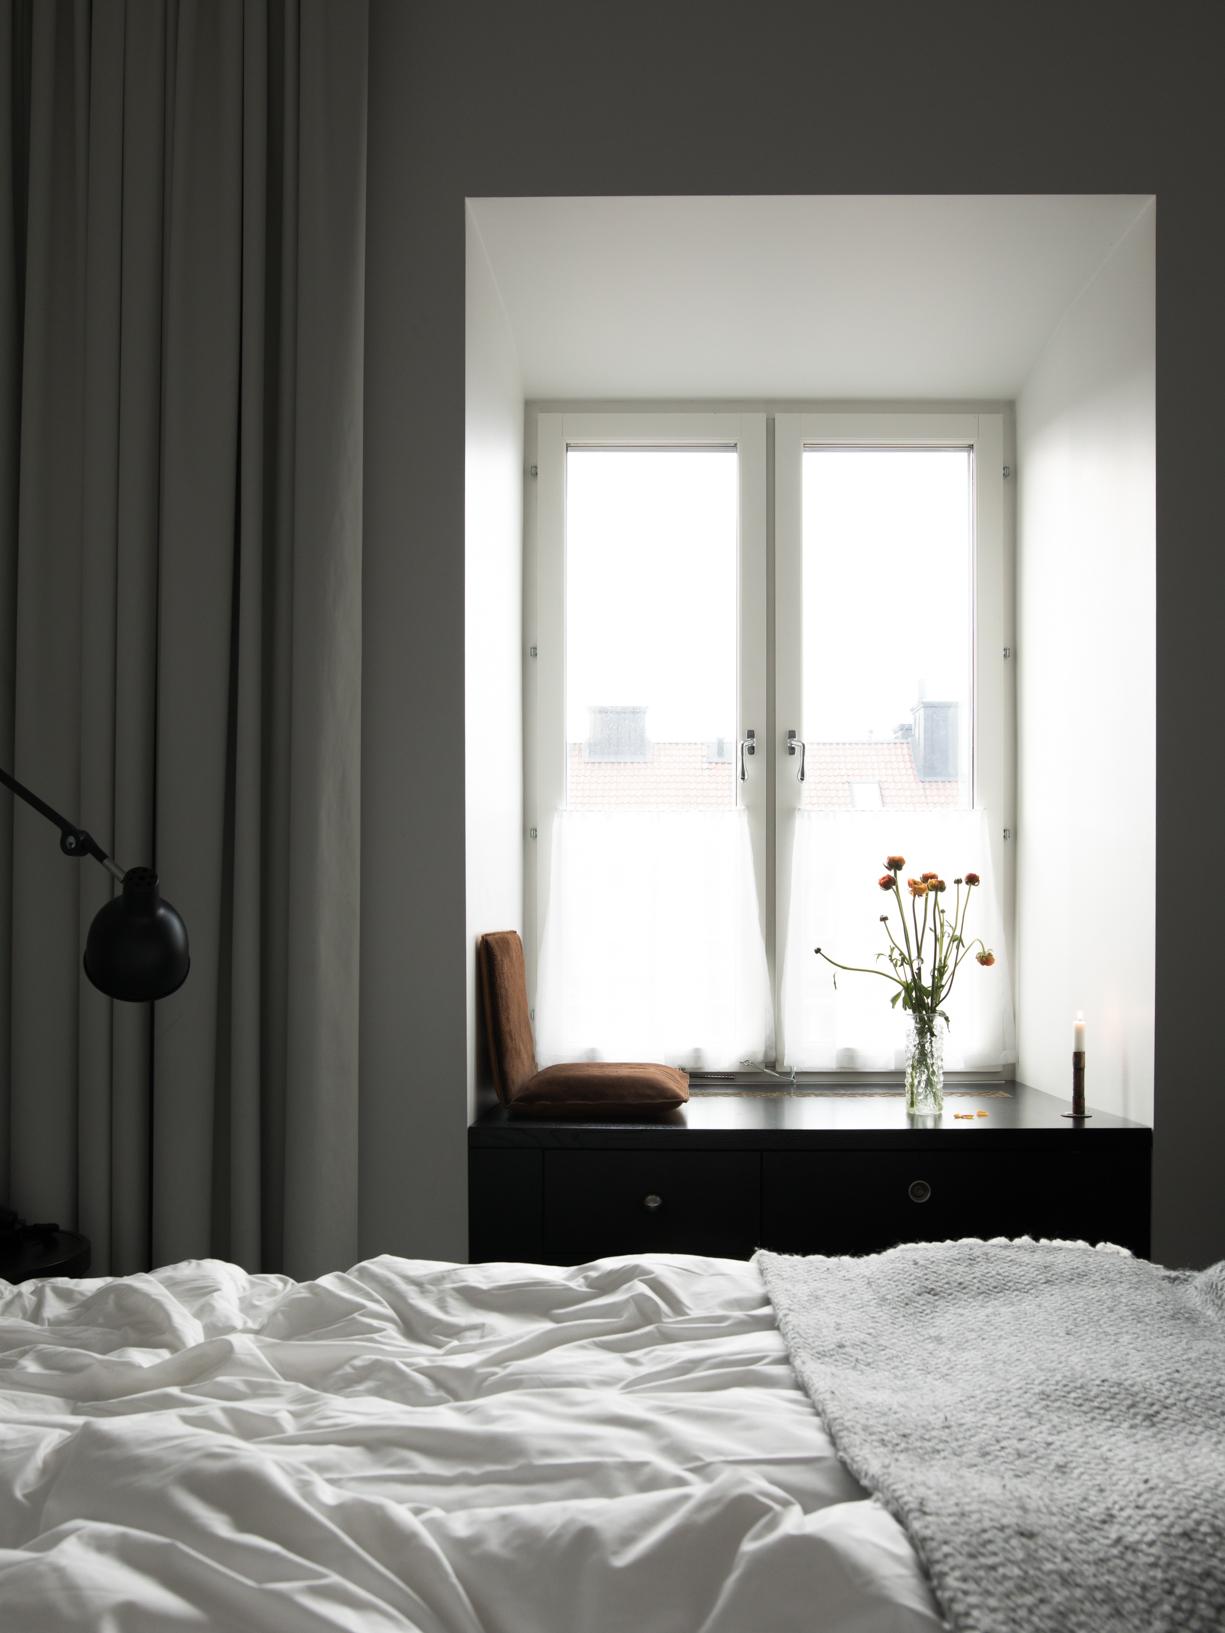 4_Miss-Clara-hotell_Daniella-Witte.jpg